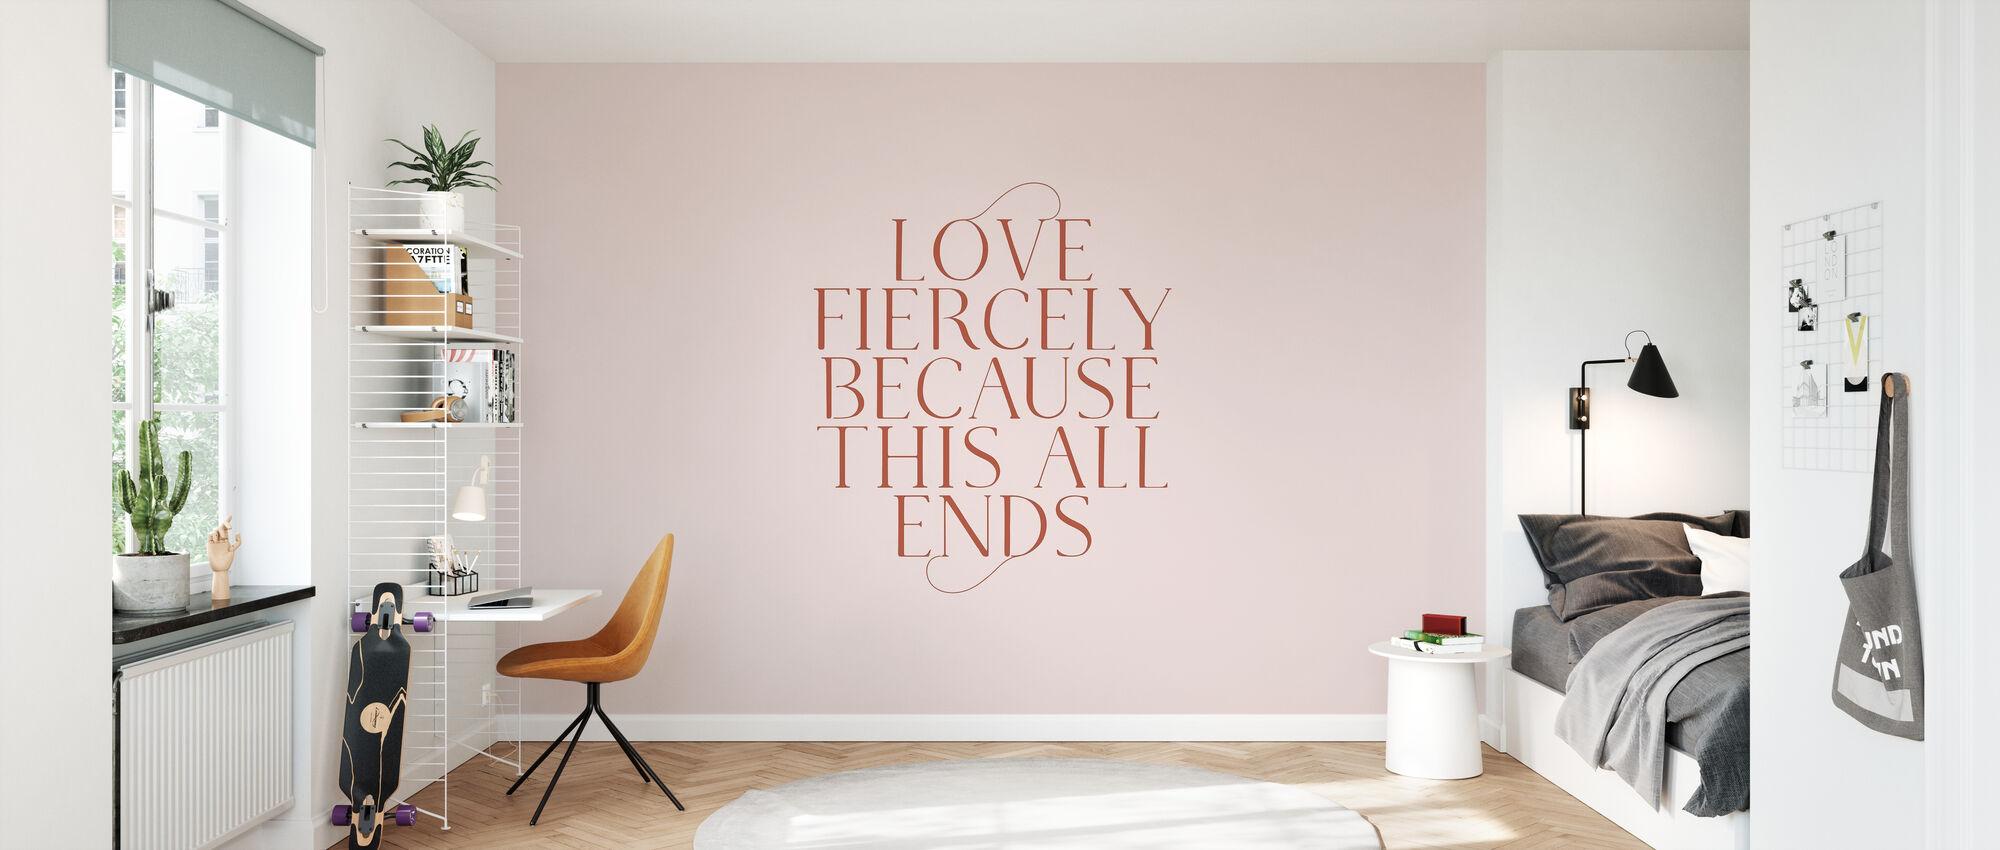 Liefde fel - Behang - Kinderkamer